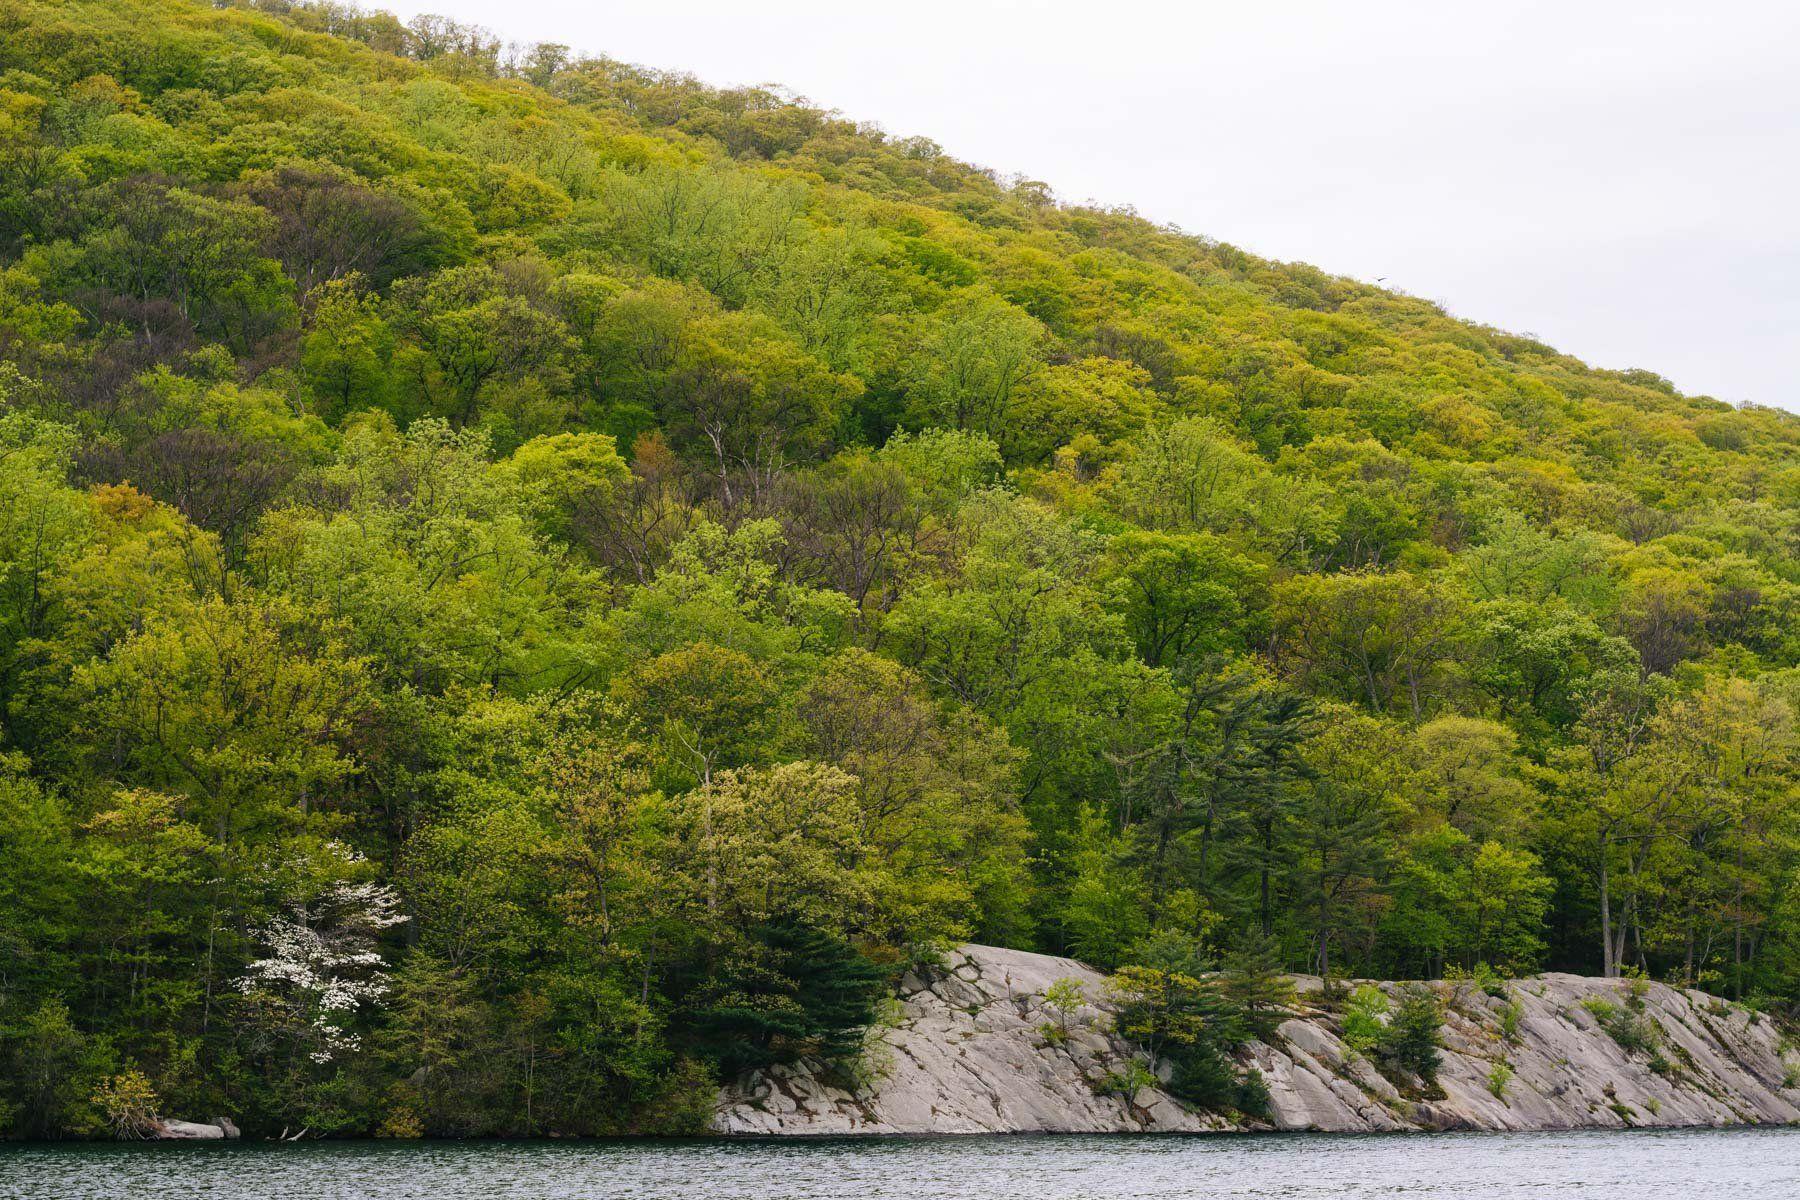 Rocky landscape along Hessian Lake, at Bear Mountain State Park, New York.